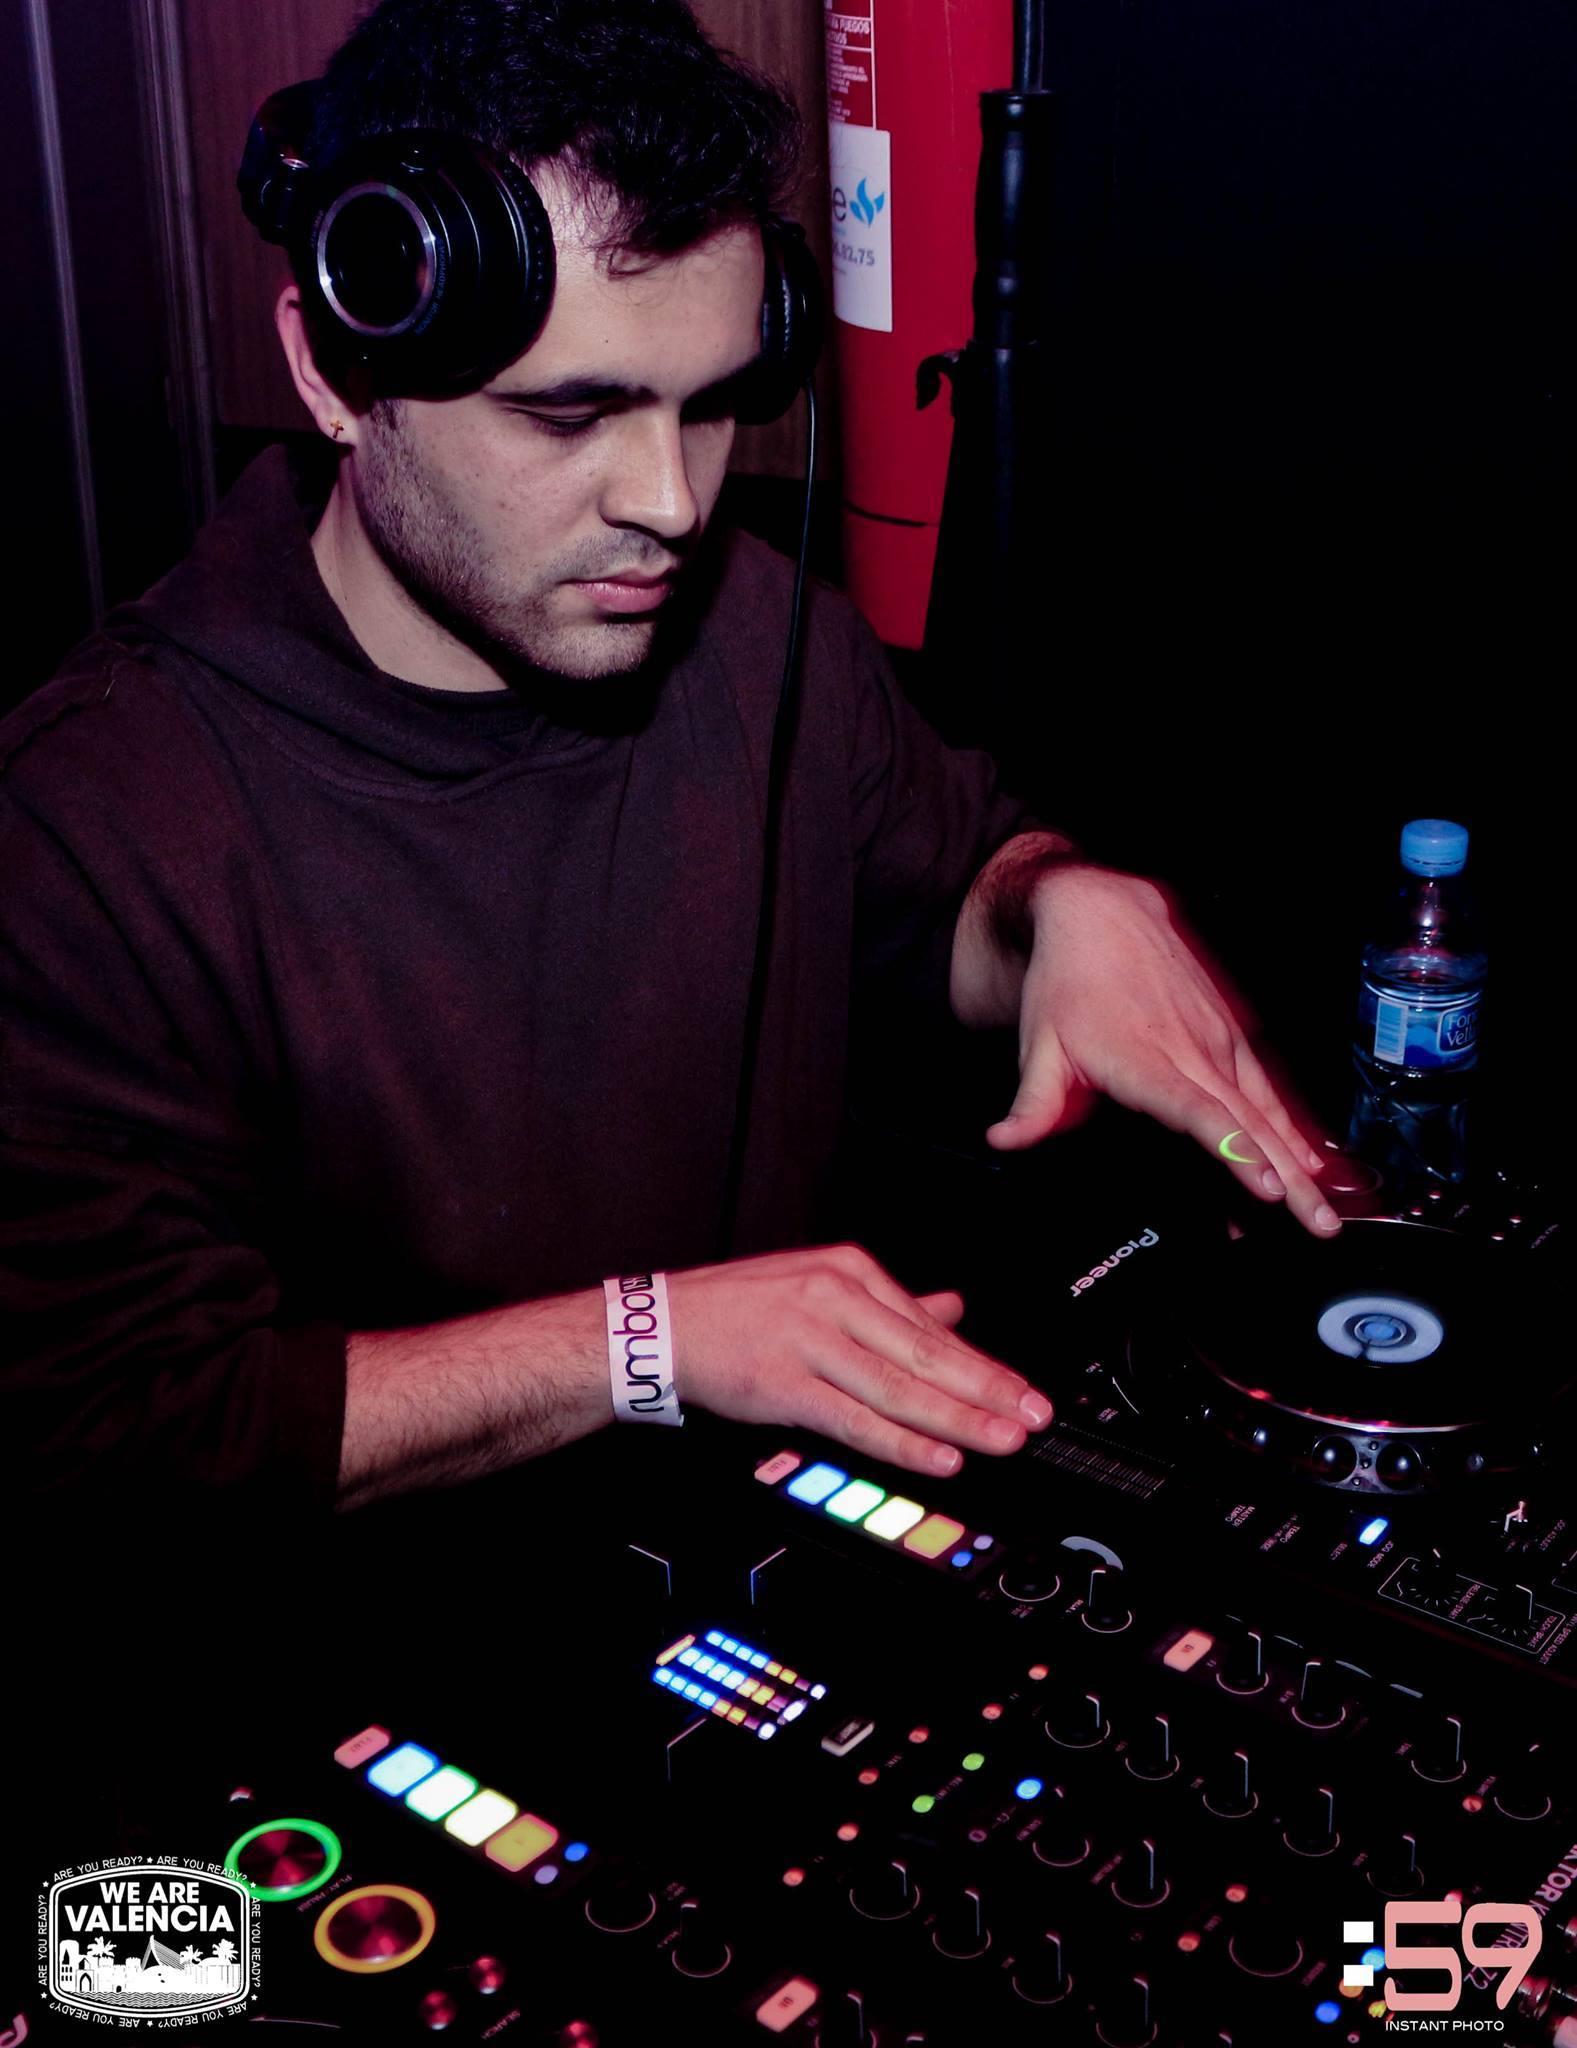 DJ Ell Rumbo 144, Valencia Spain